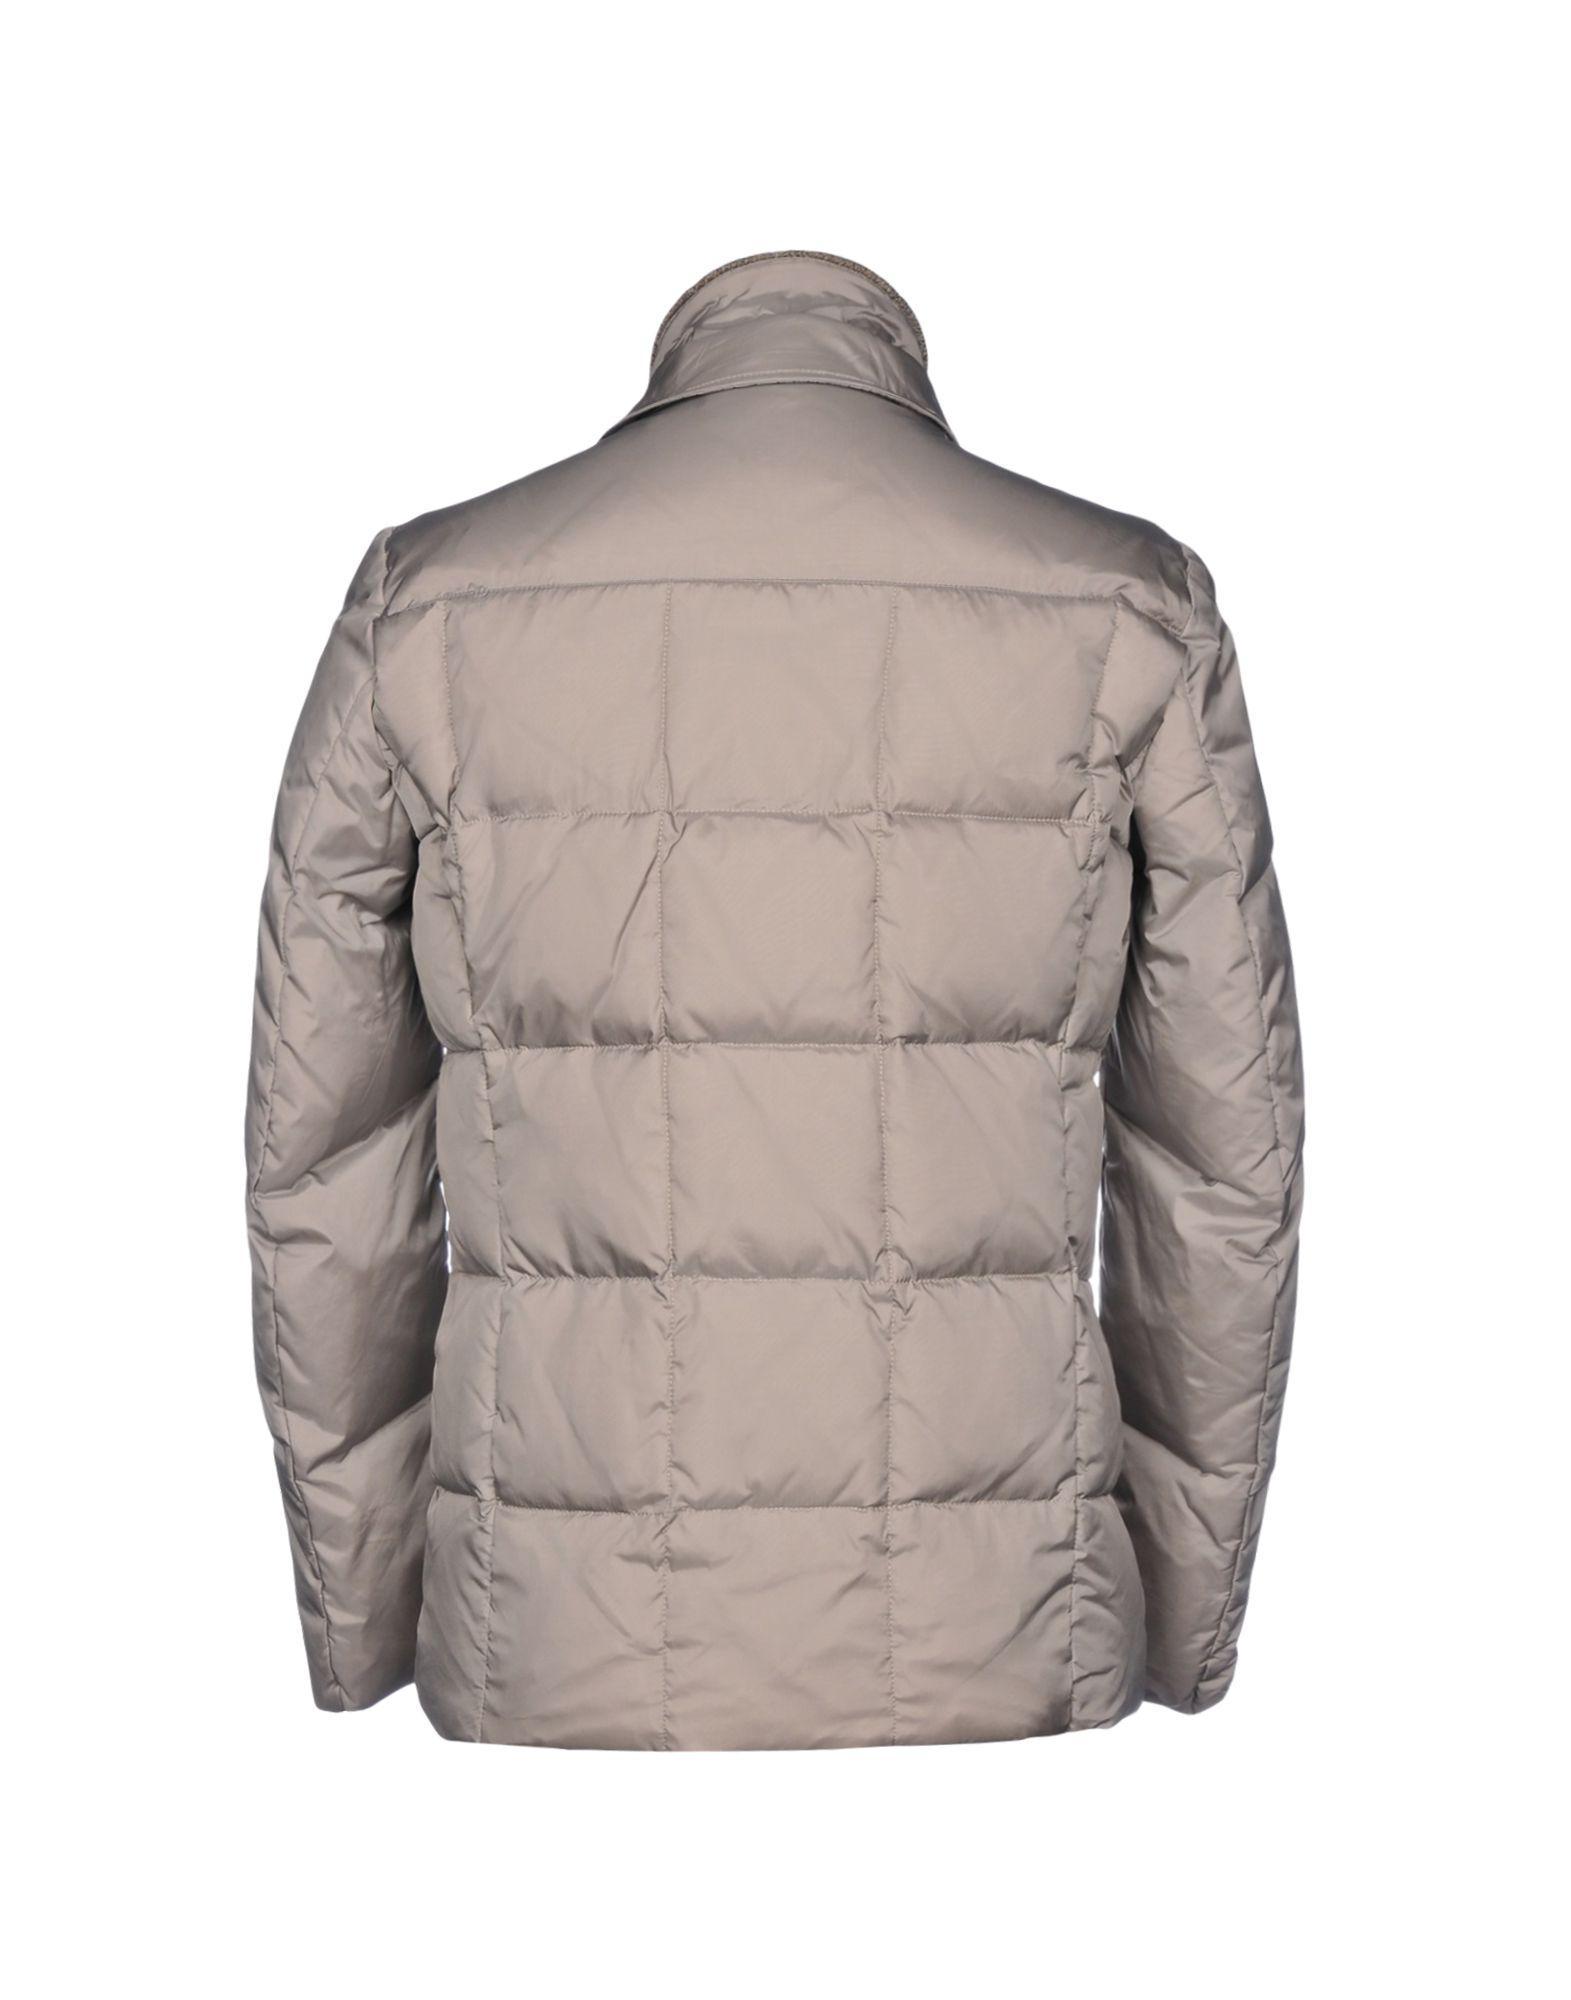 Yuko Goose Down Jacket in Grey (Grey) for Men